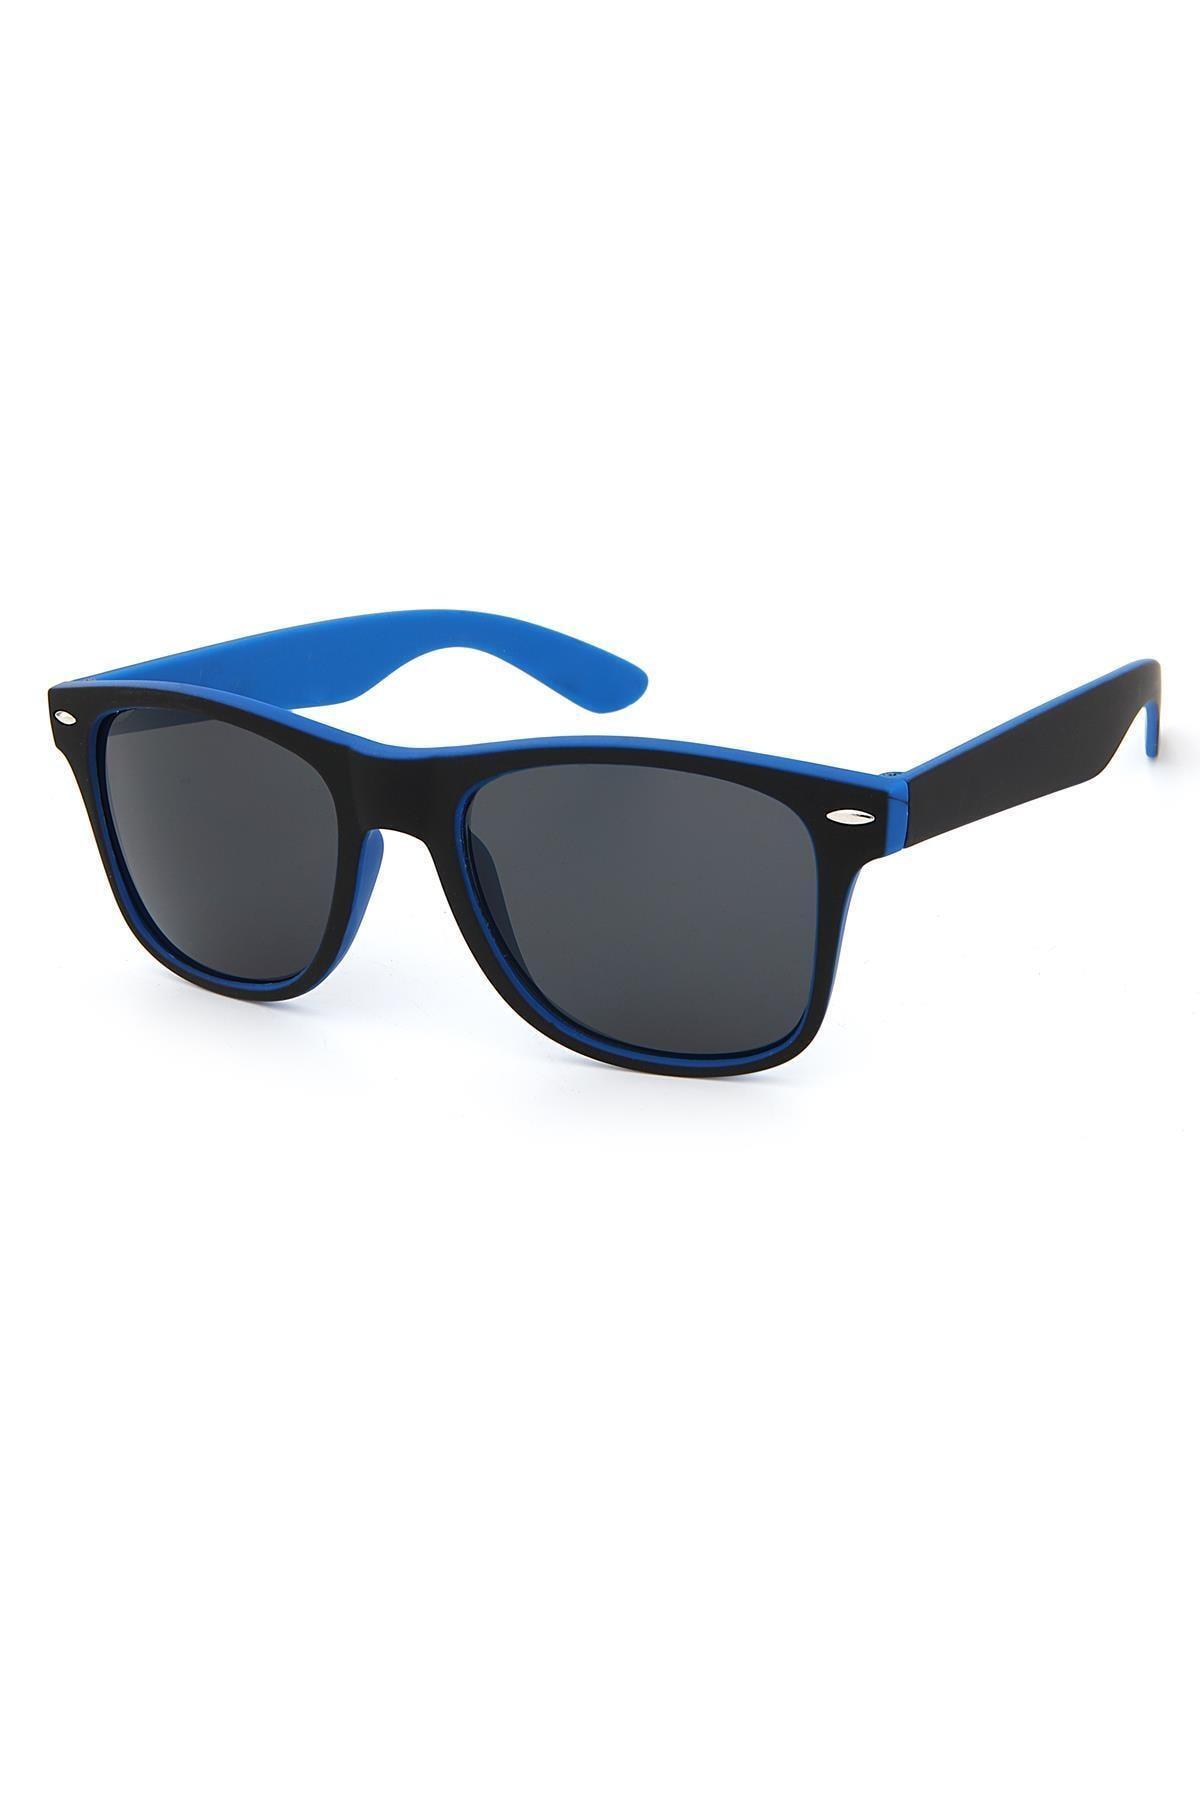 Di Caprio Unisex Güneş Gözlüğü Dc1783a 1